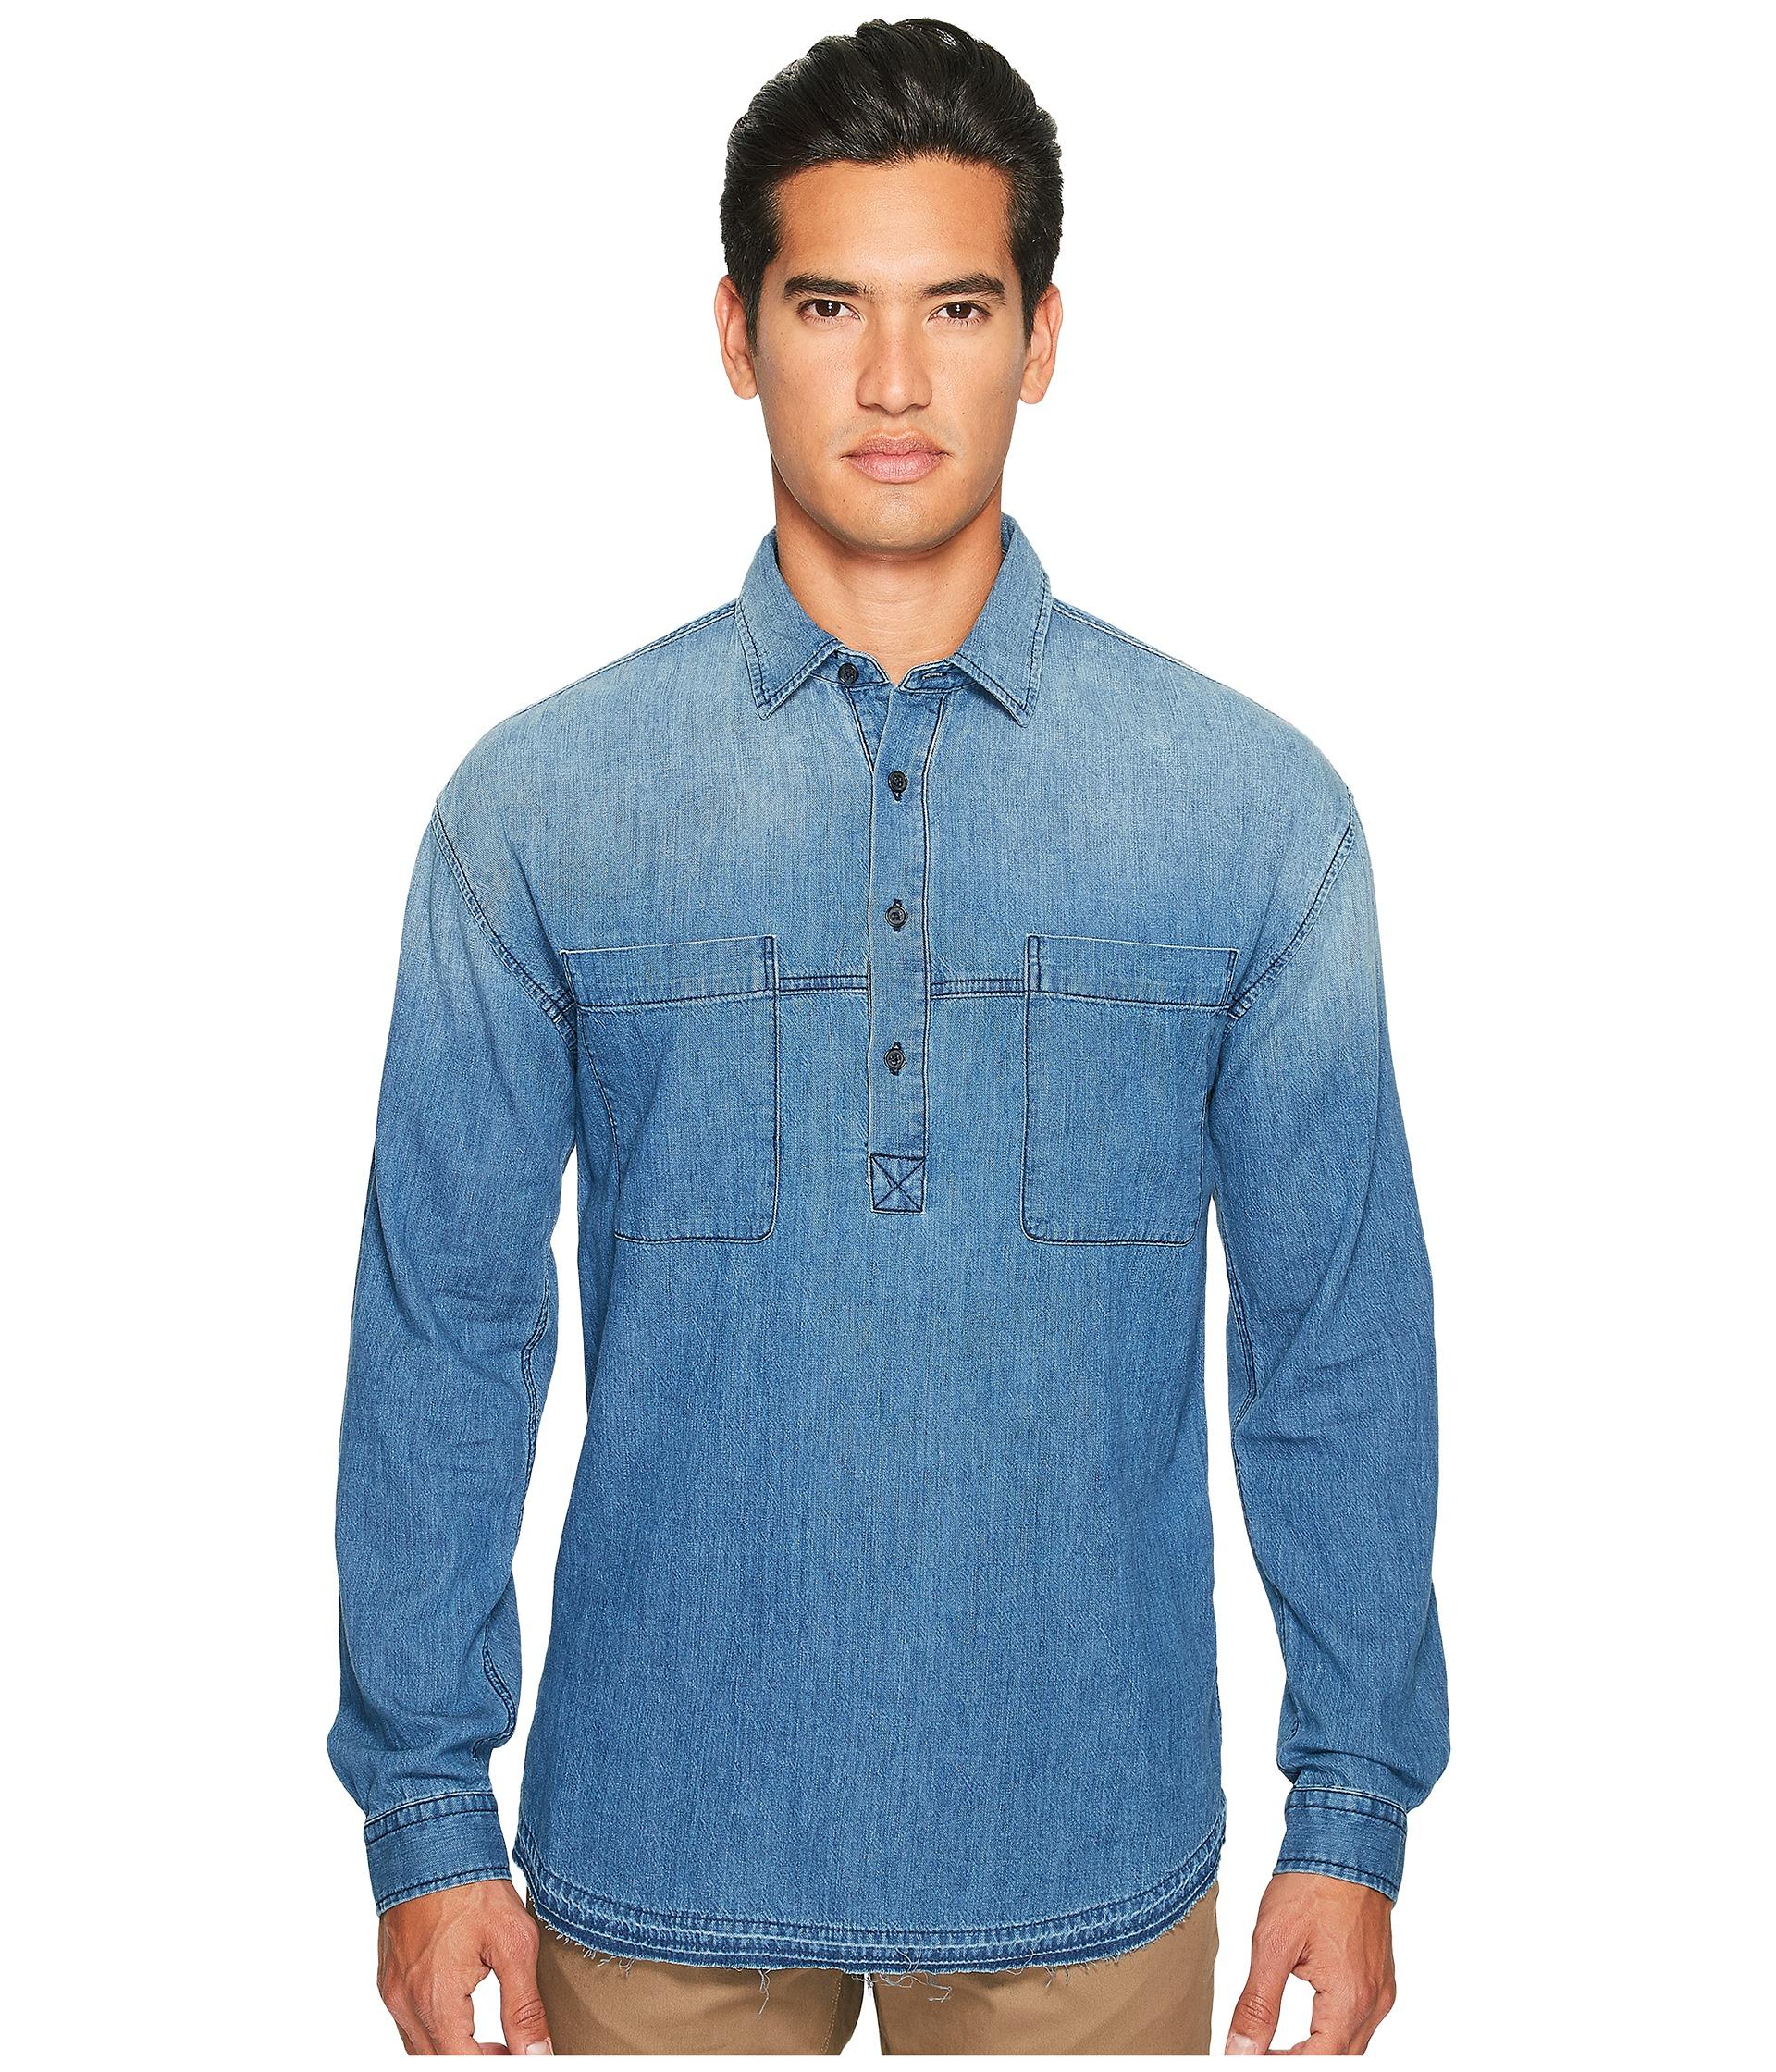 Vince Denim 1/2 Placket Pullover Shirt at Zappos.com